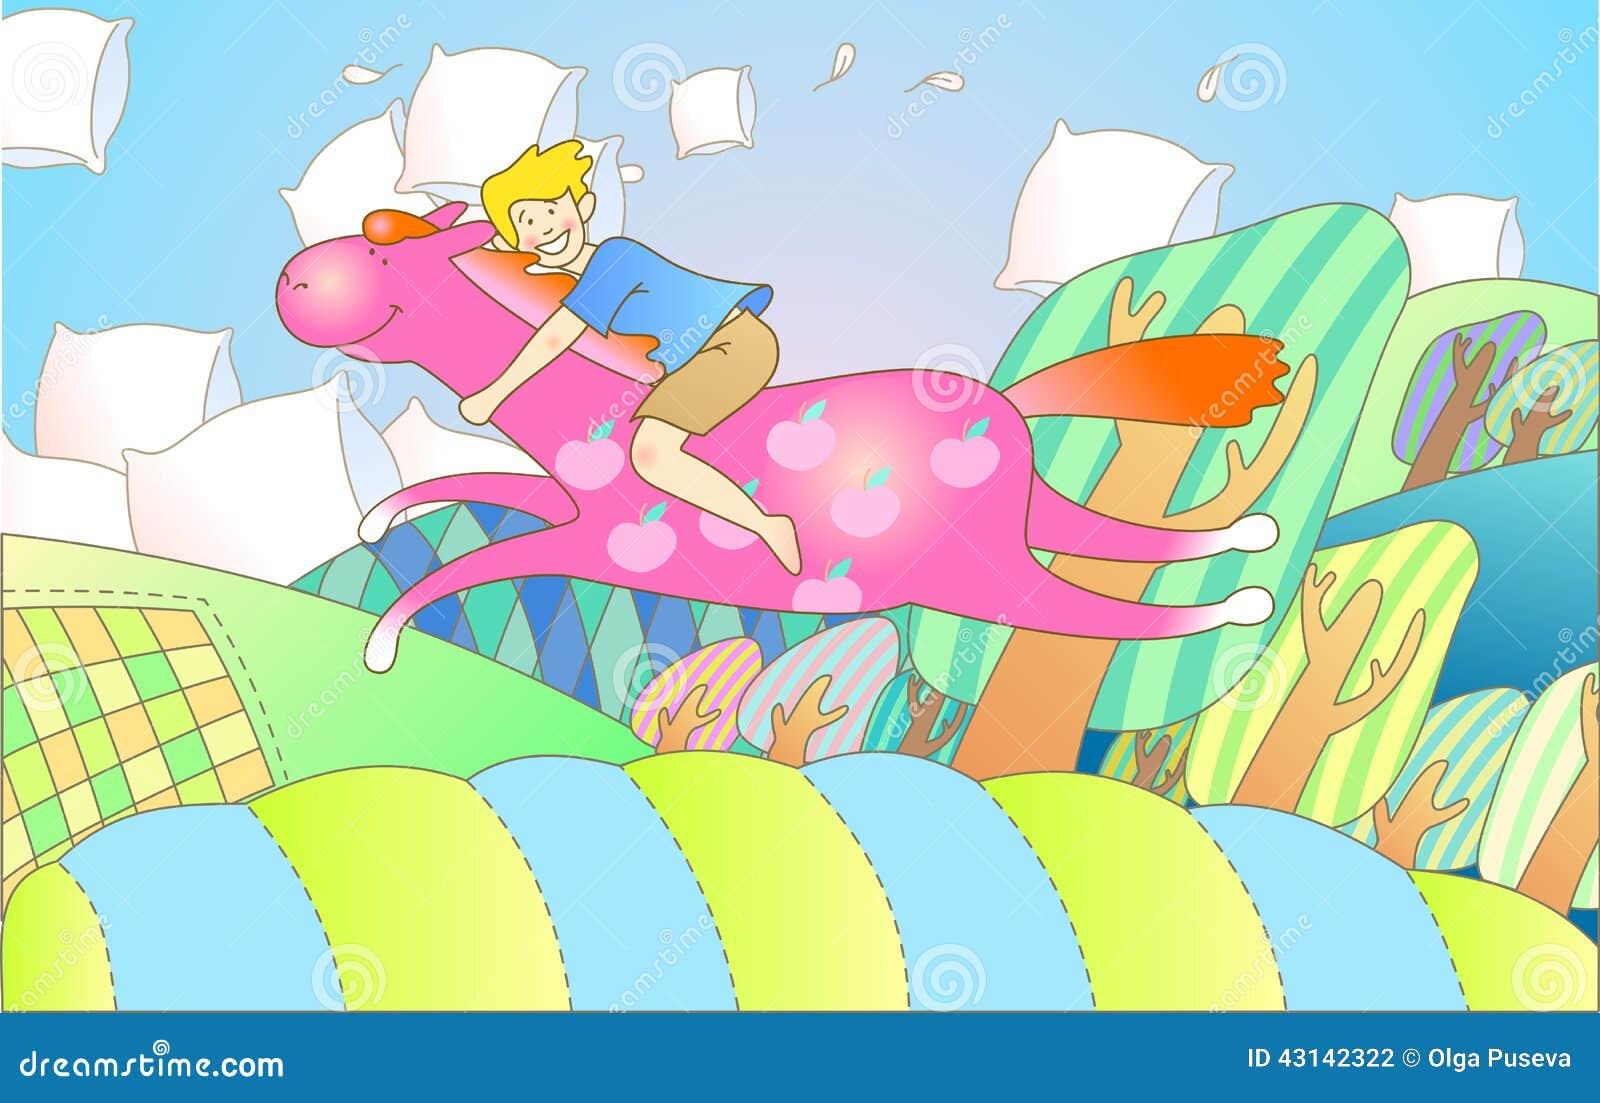 Cgs riding dreams his moms best friend